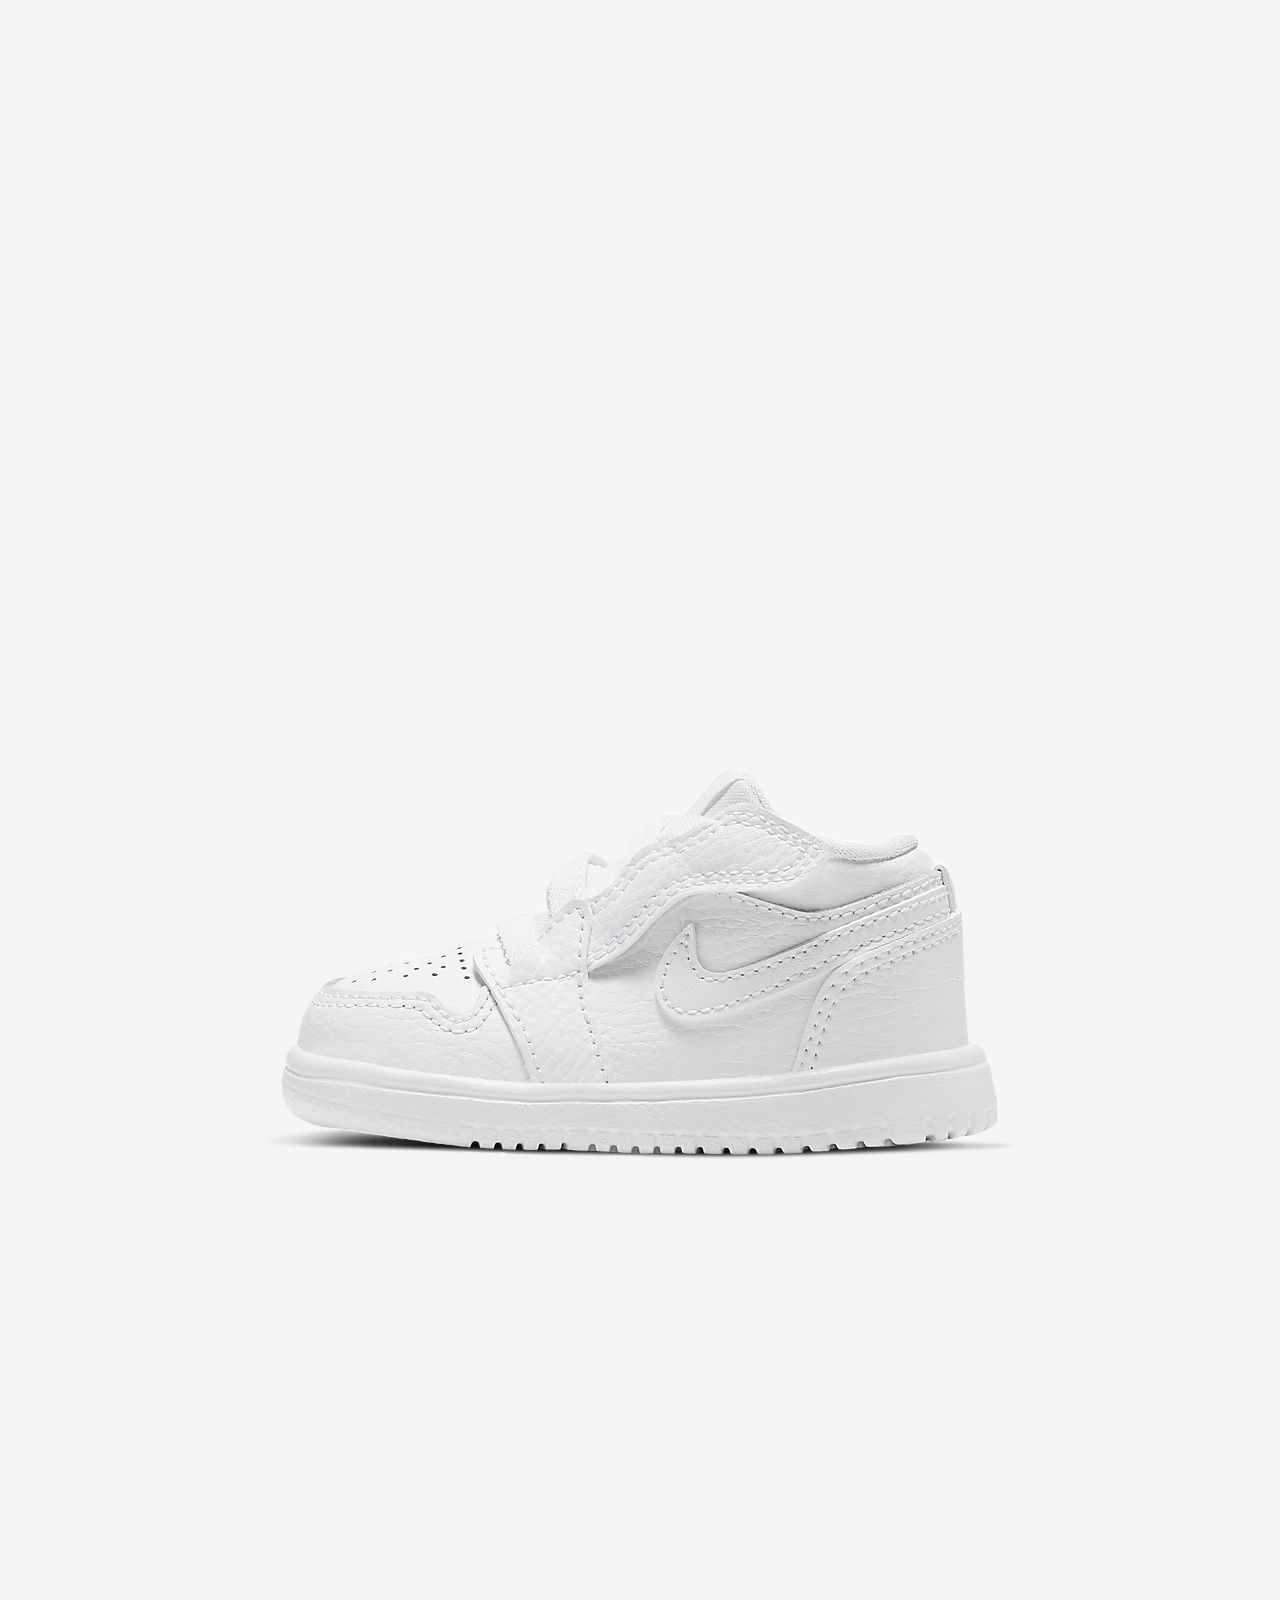 the latest 2355d 16182 ... Jordan 1 Low Alt (TD) 婴童运动童鞋